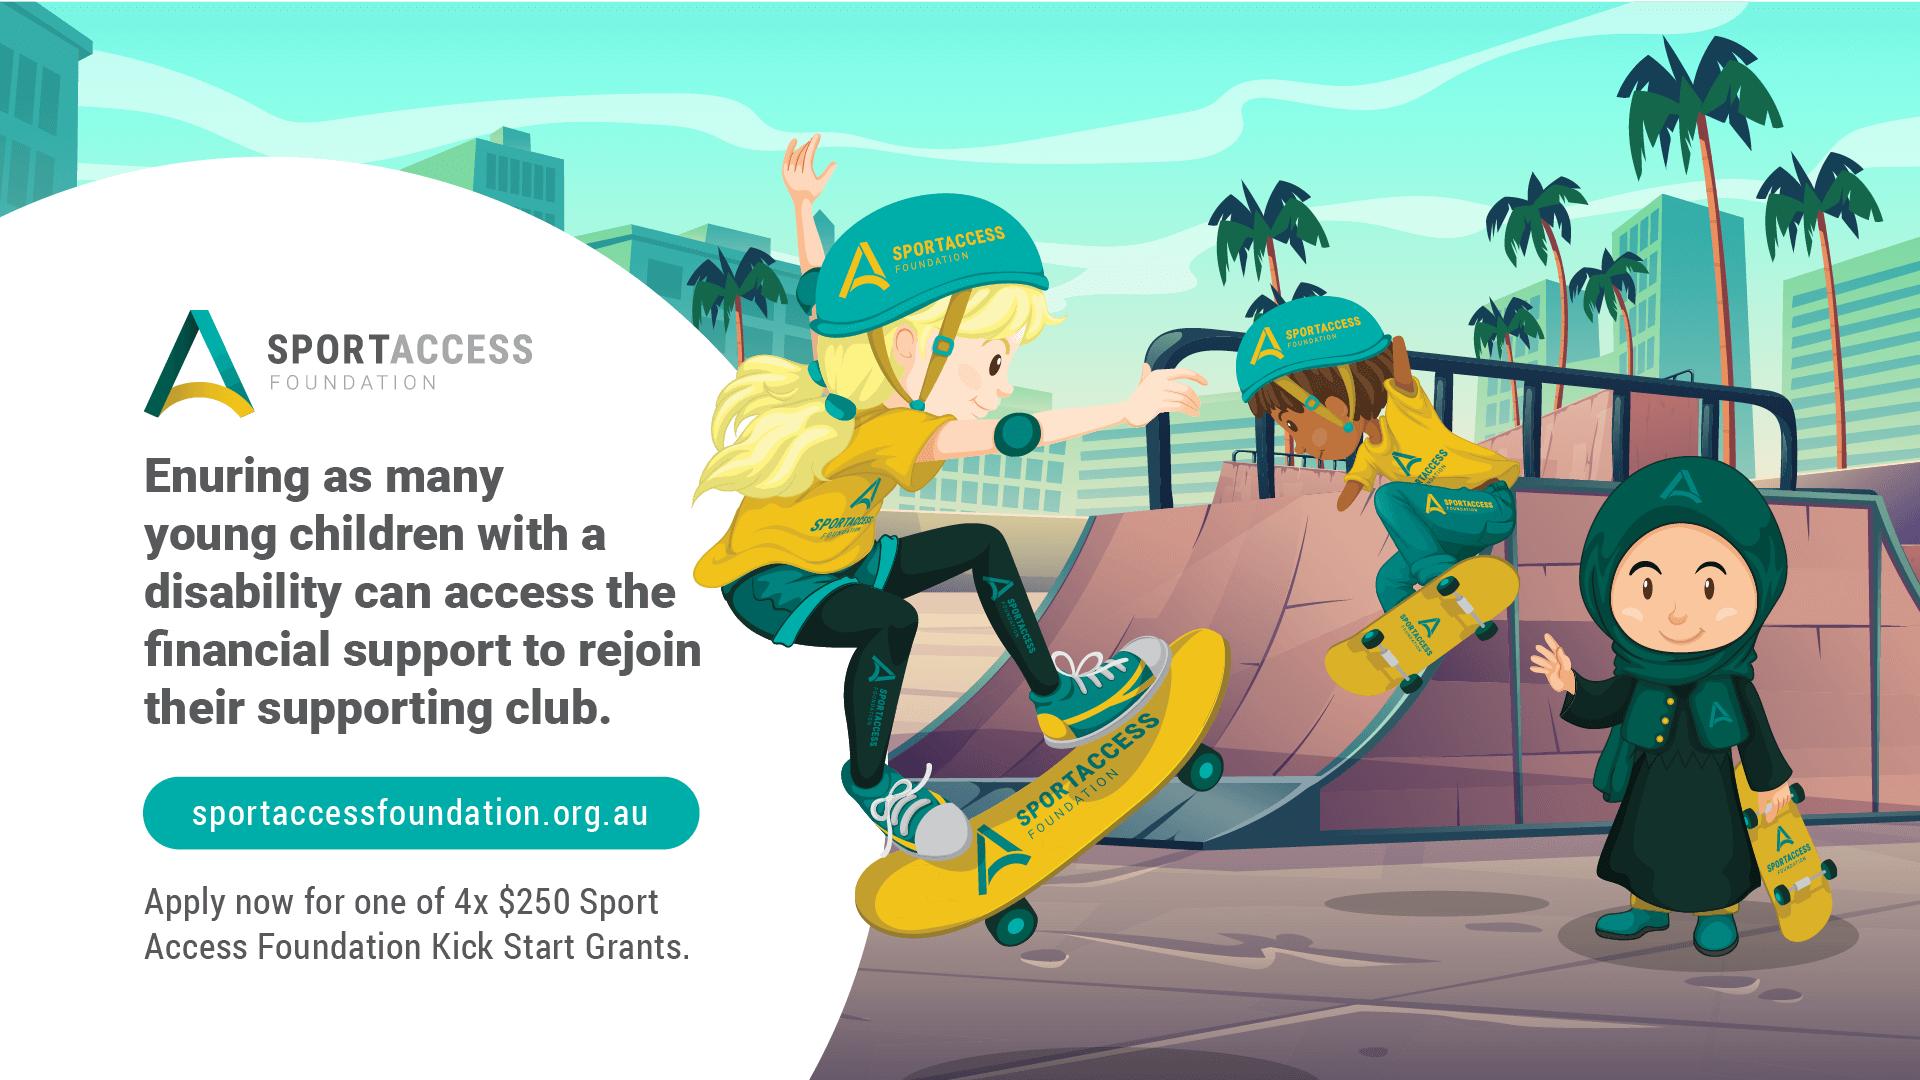 Sport Access Foundation Kick Start Grant